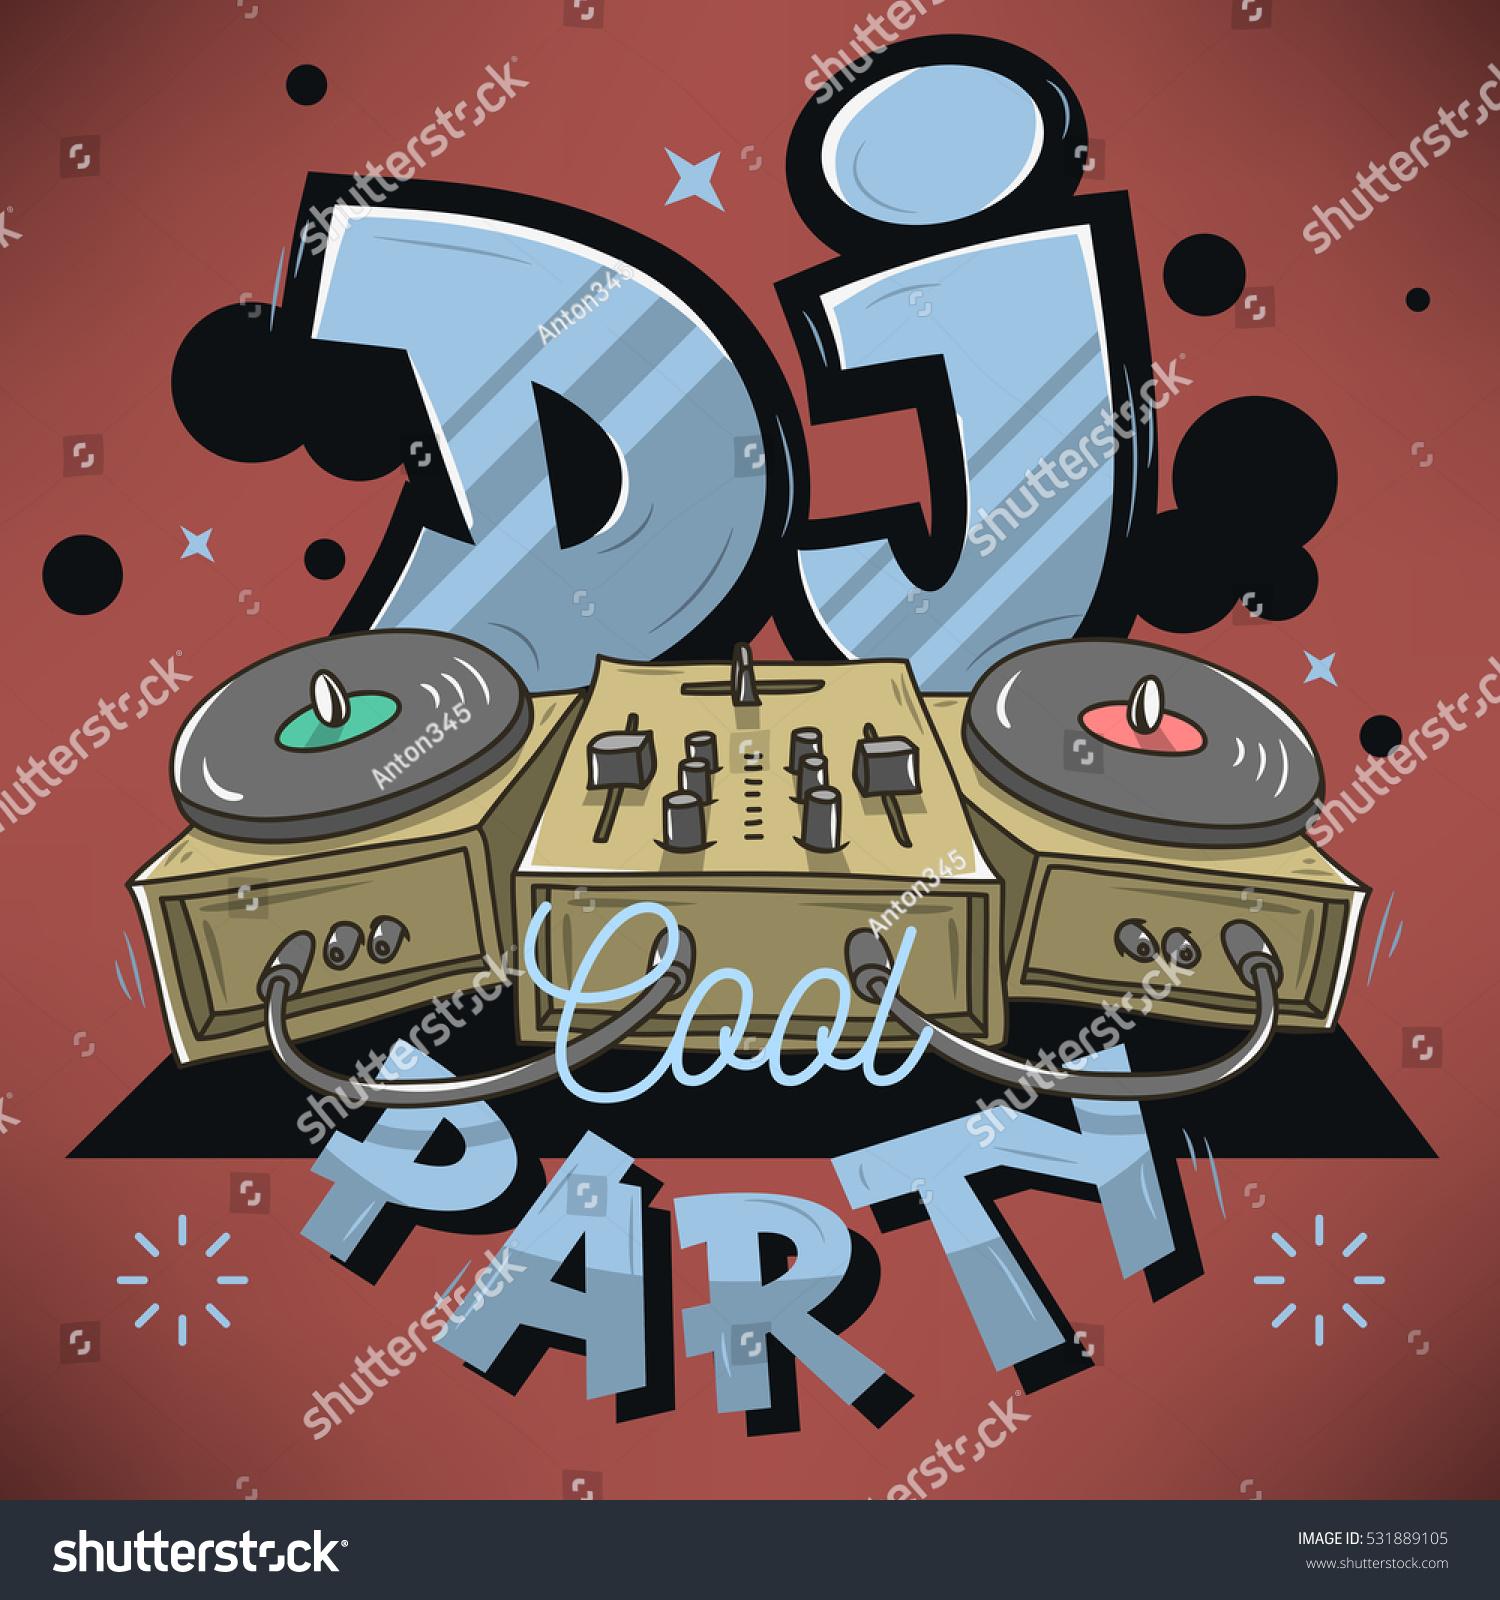 dj cool party design event poster stock vector 531889105 shutterstock. Black Bedroom Furniture Sets. Home Design Ideas